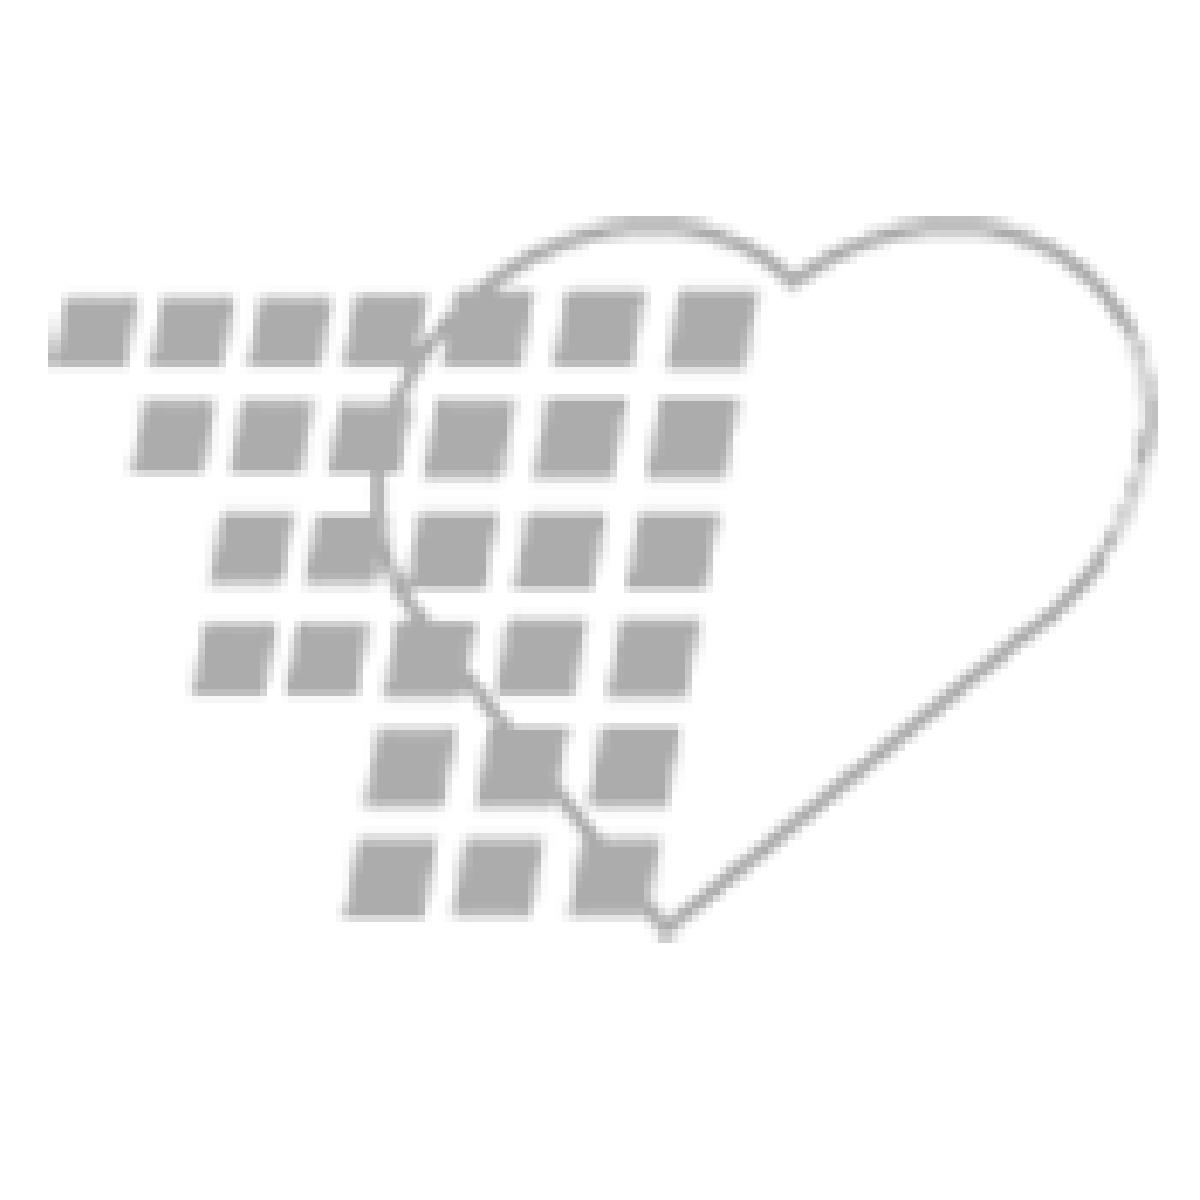 02-24-0172 - Fetal Monitor